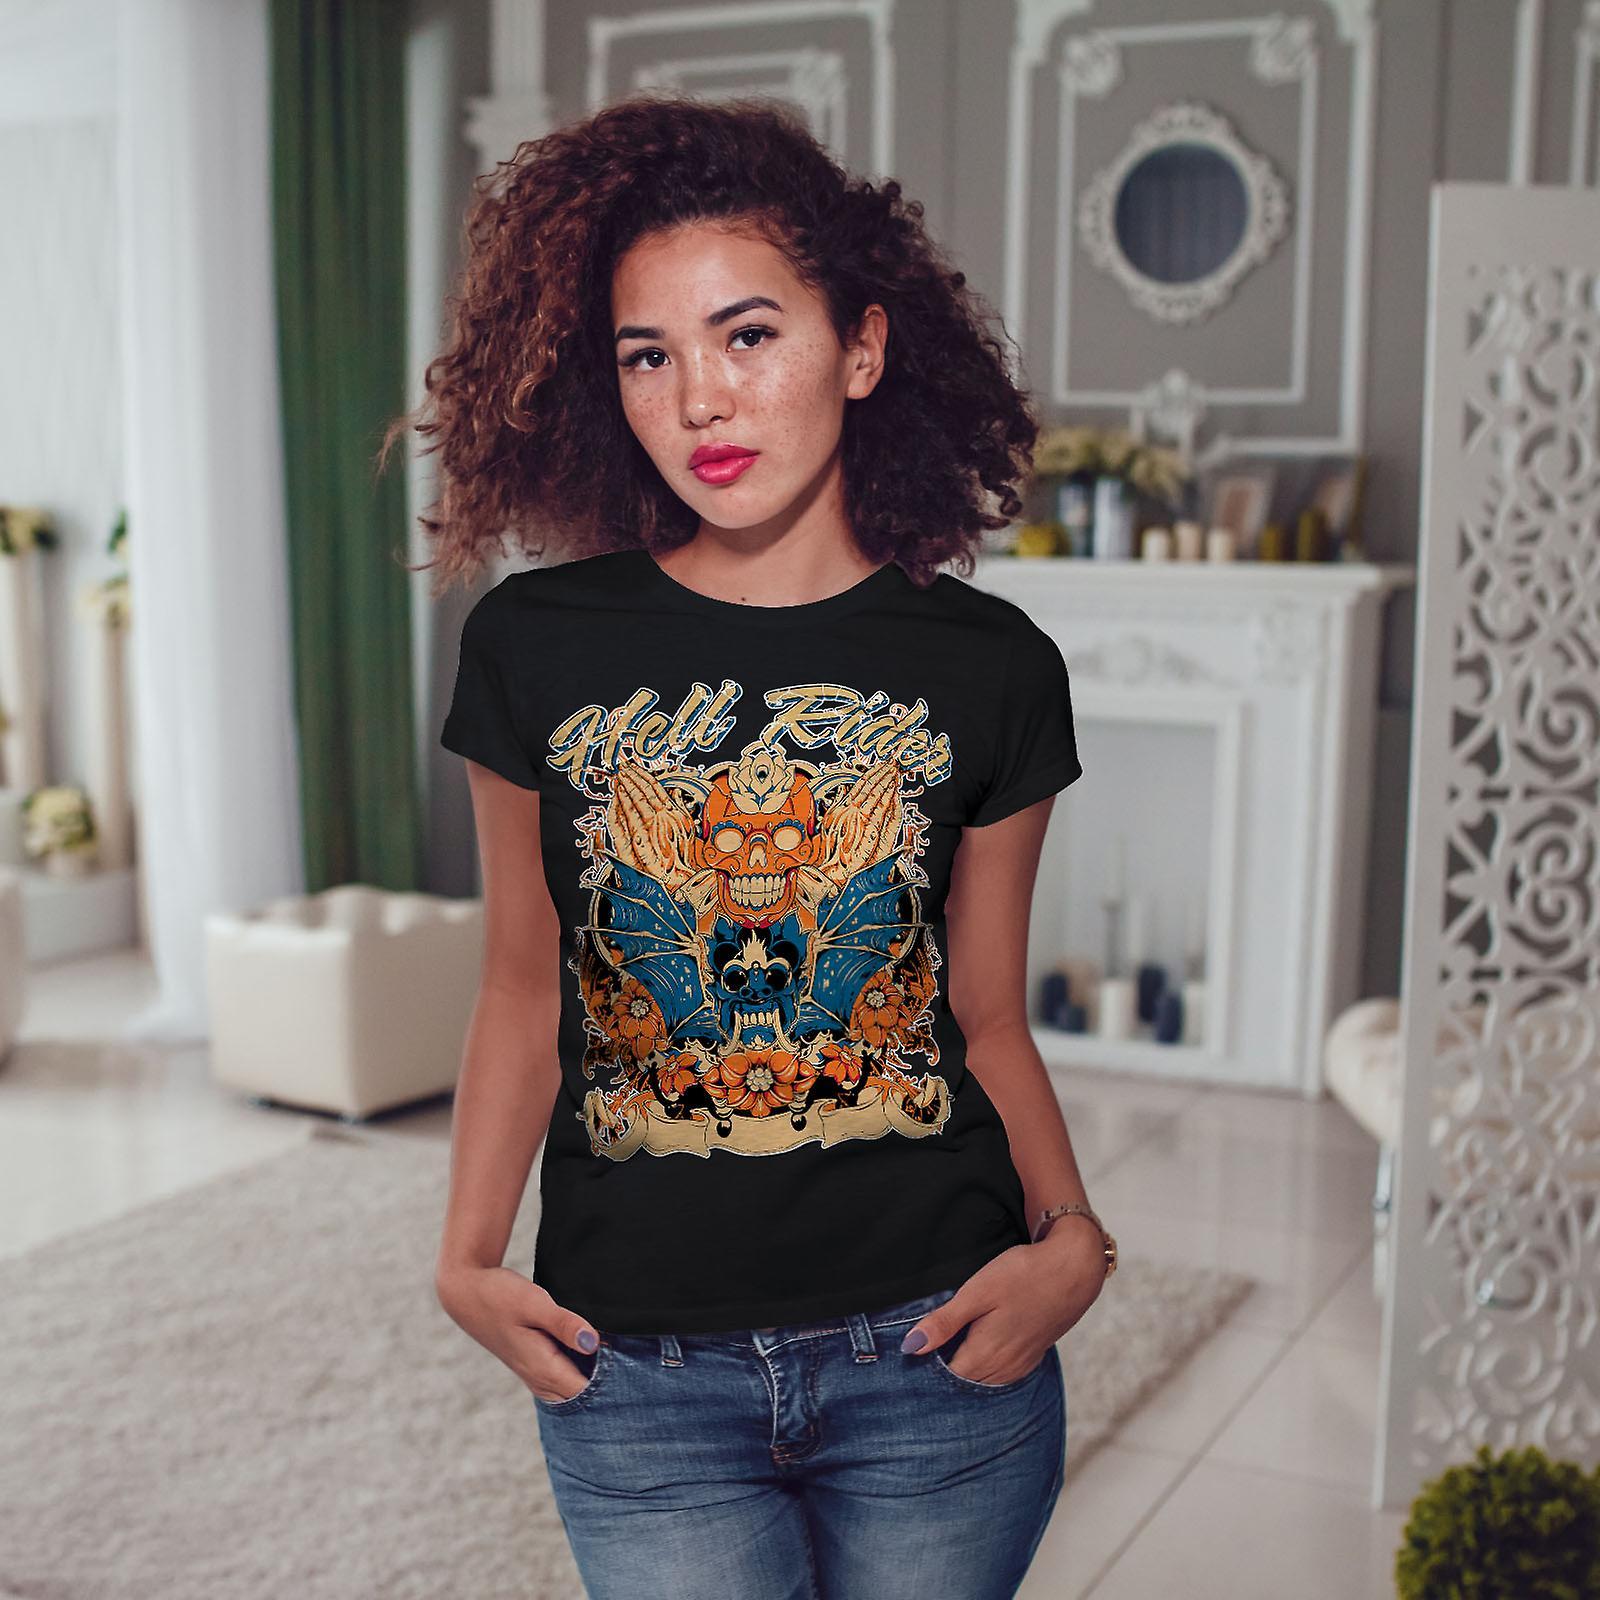 Hell Rider Rose Biker mujeres BlackT-camisa | Wellcoda